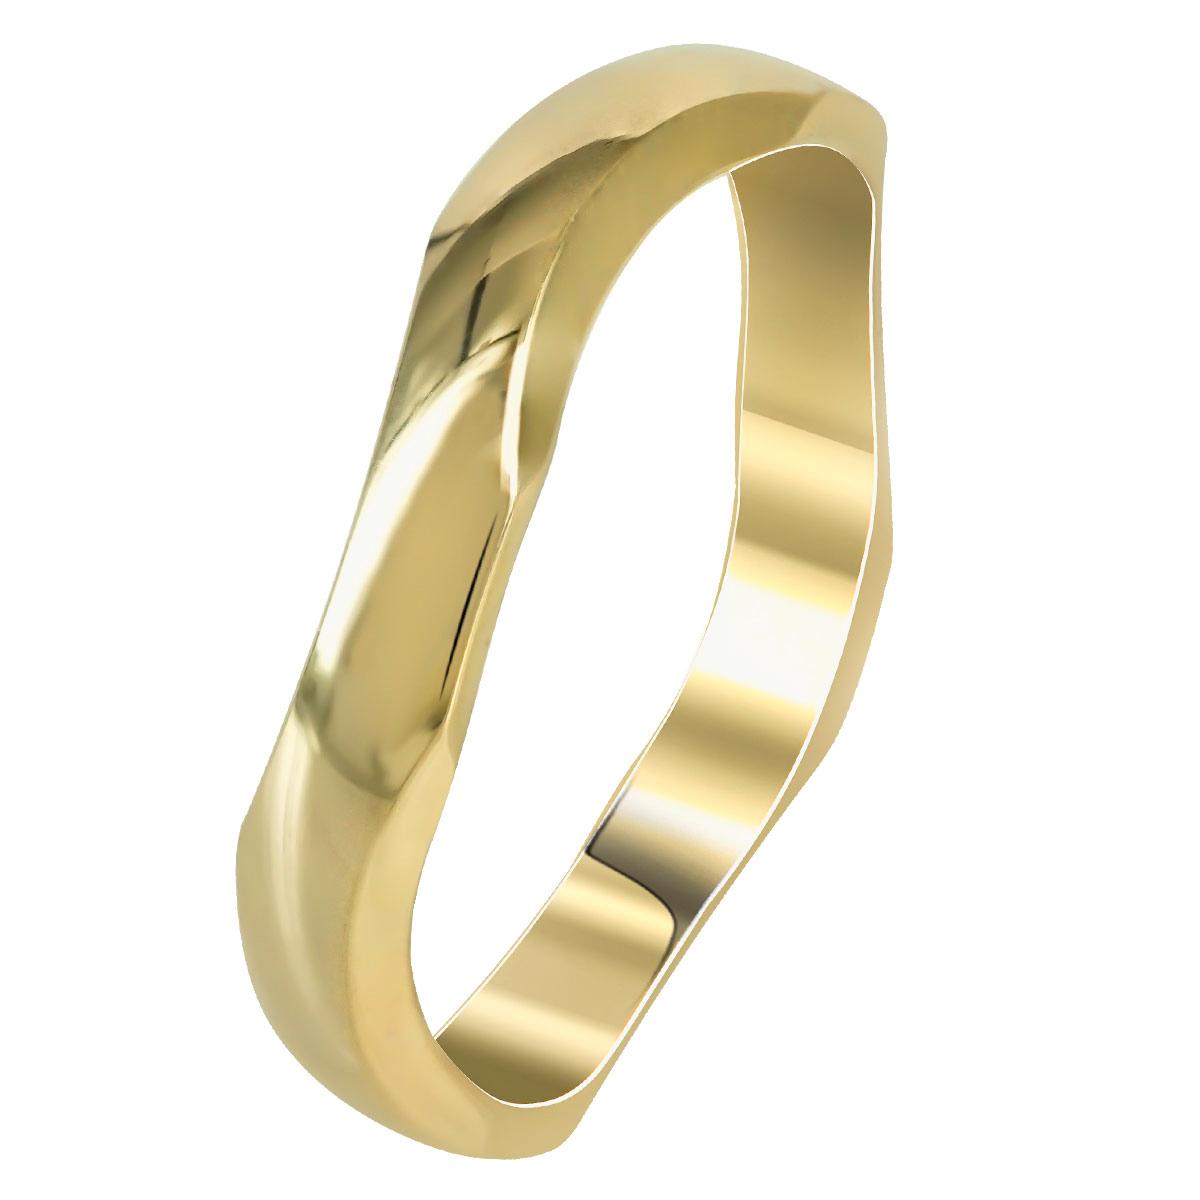 Kίτρινη Χρυσή Βέρα Γάμου WR256 k14